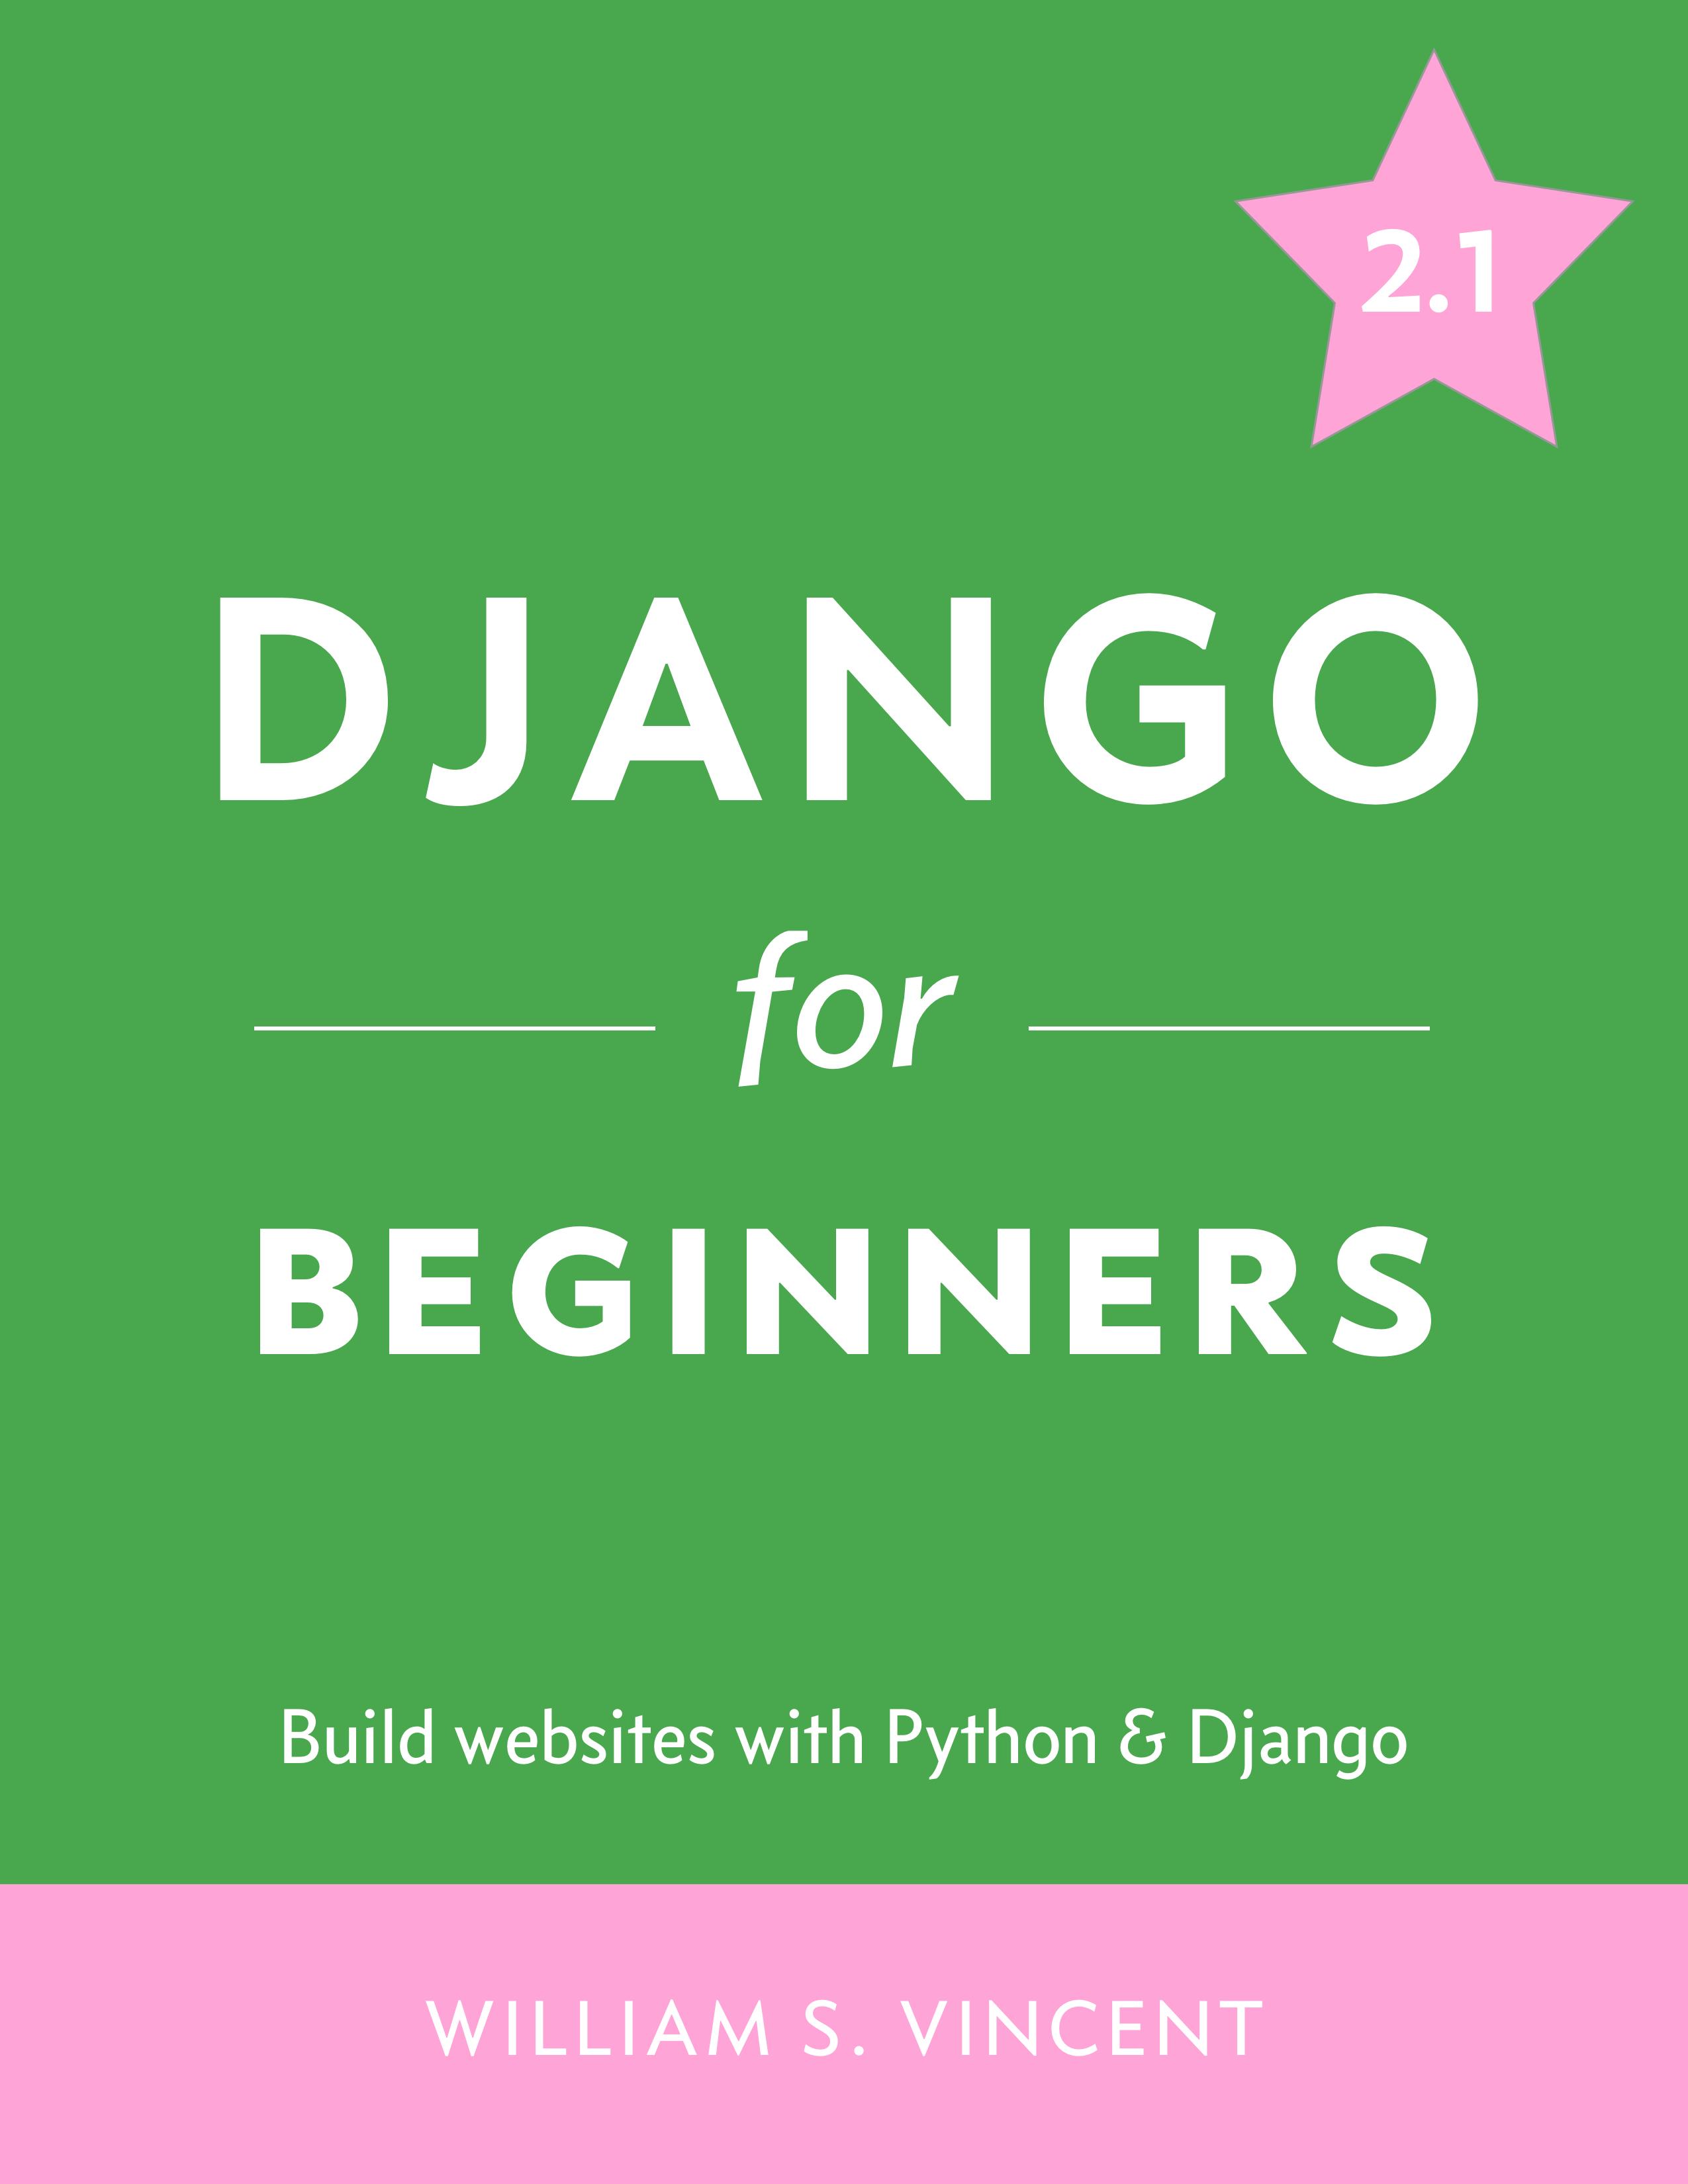 Django templates tutorial for beginners (2018) youtube.